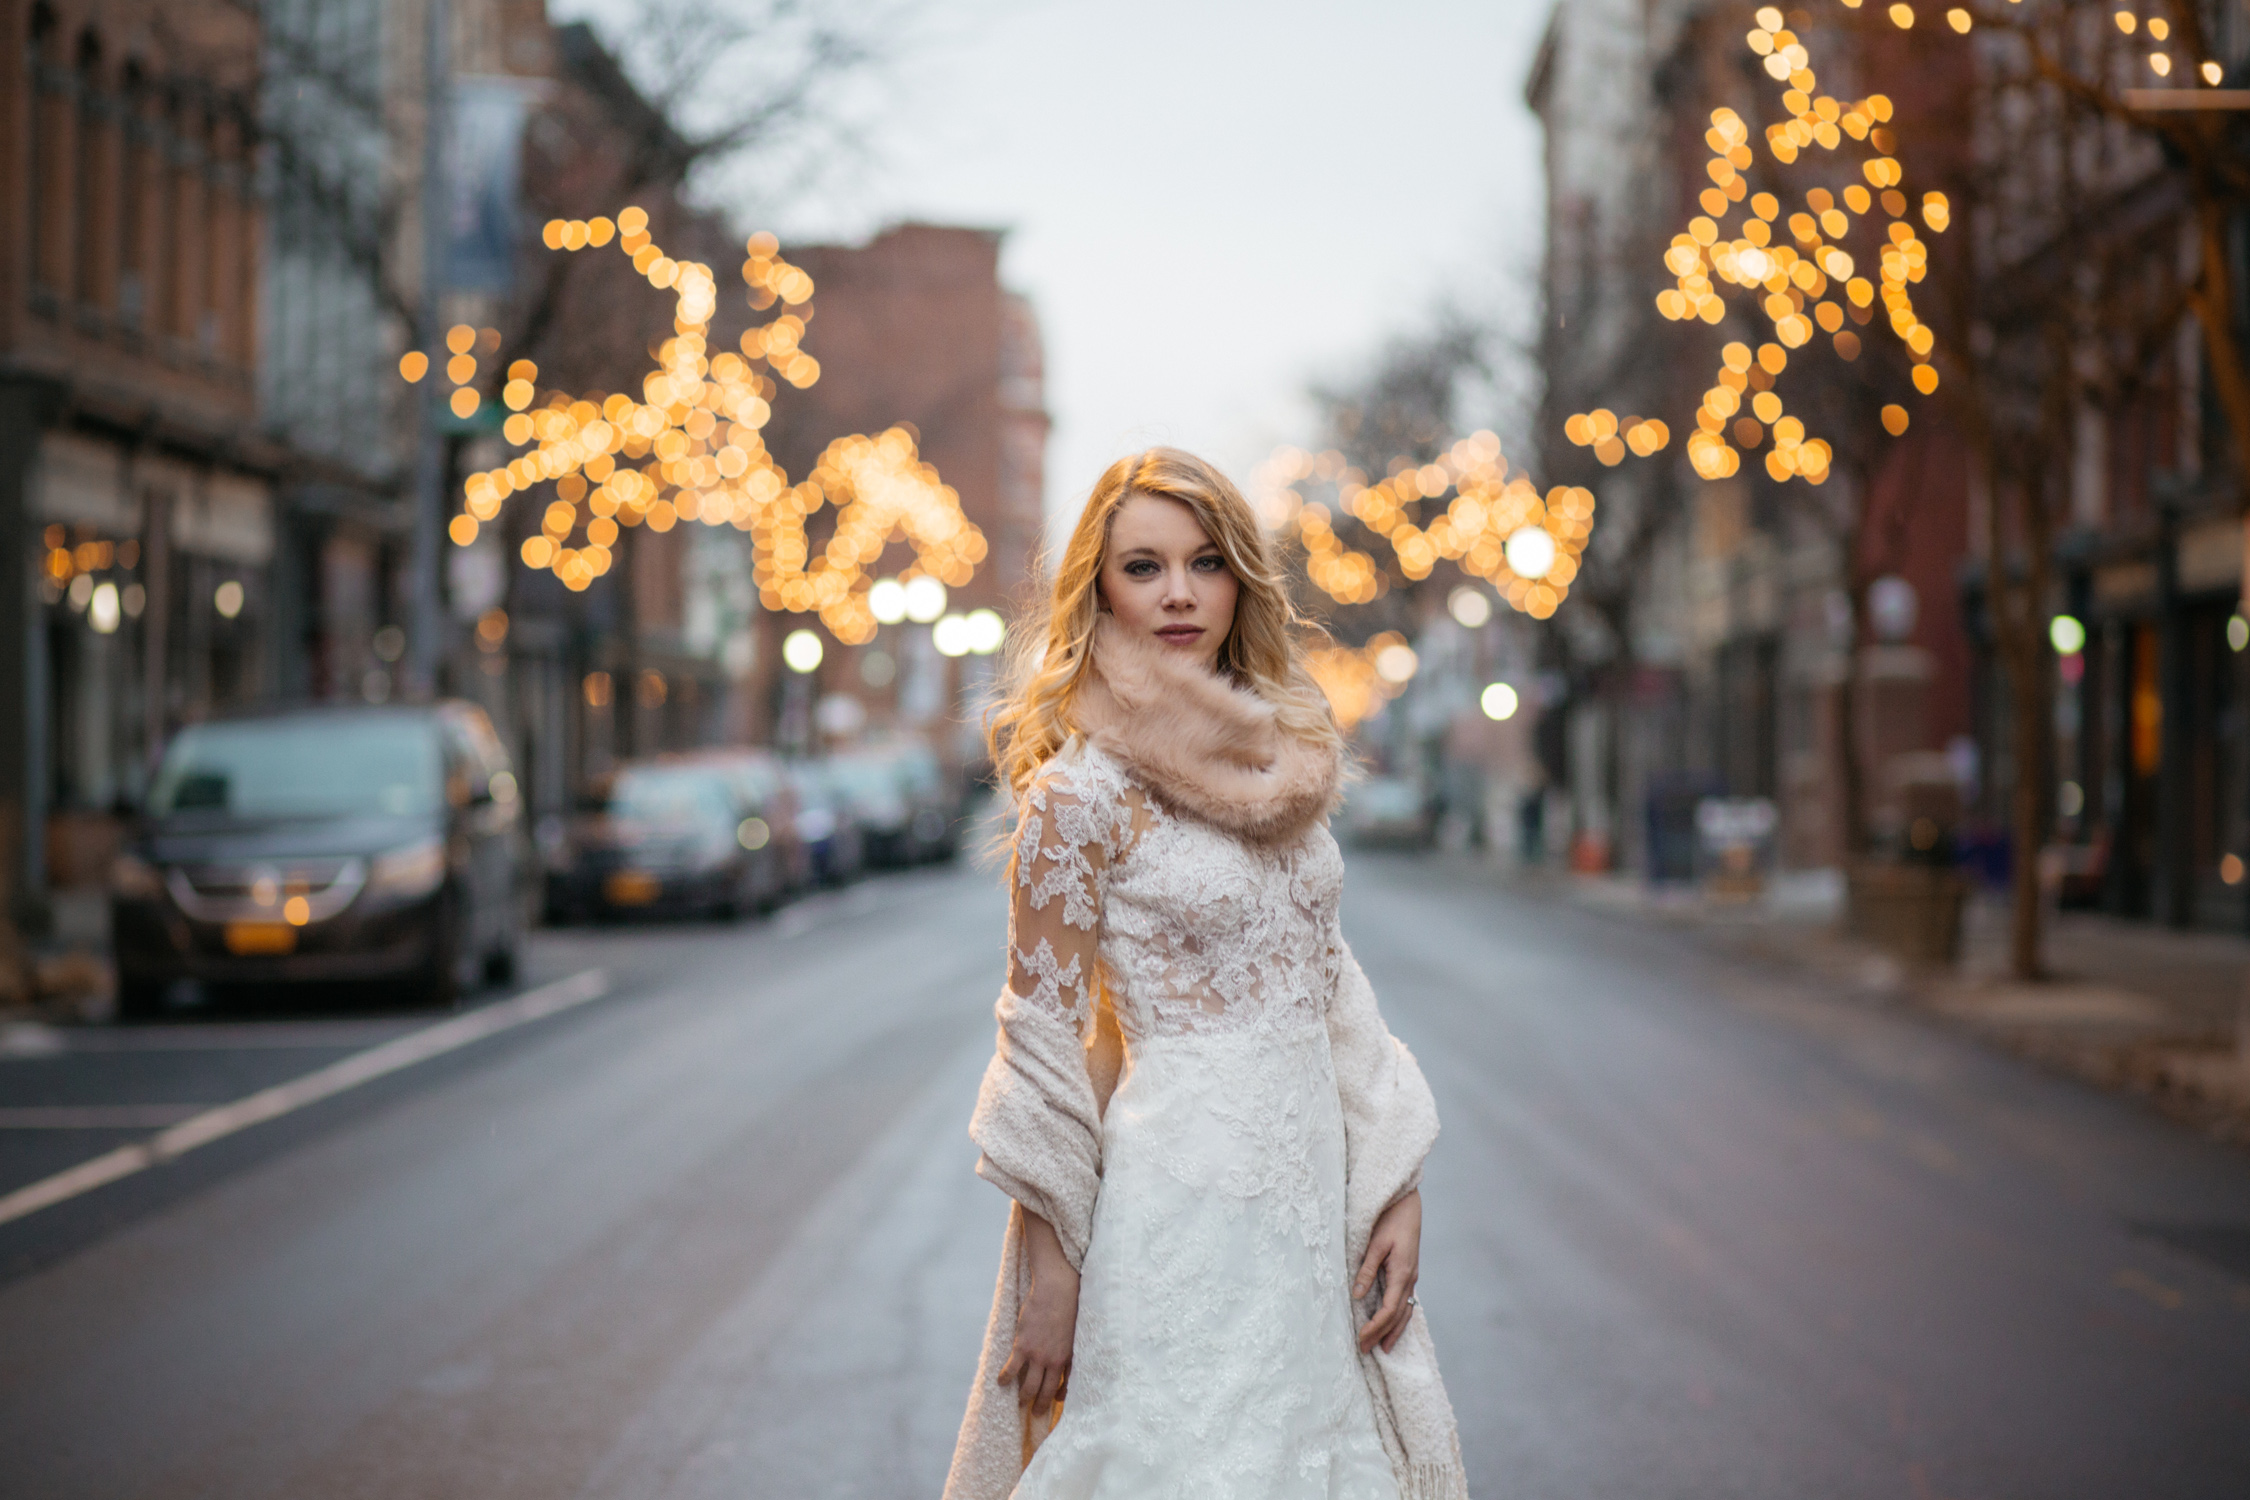 lucas_confectionery_wedding_002.jpg